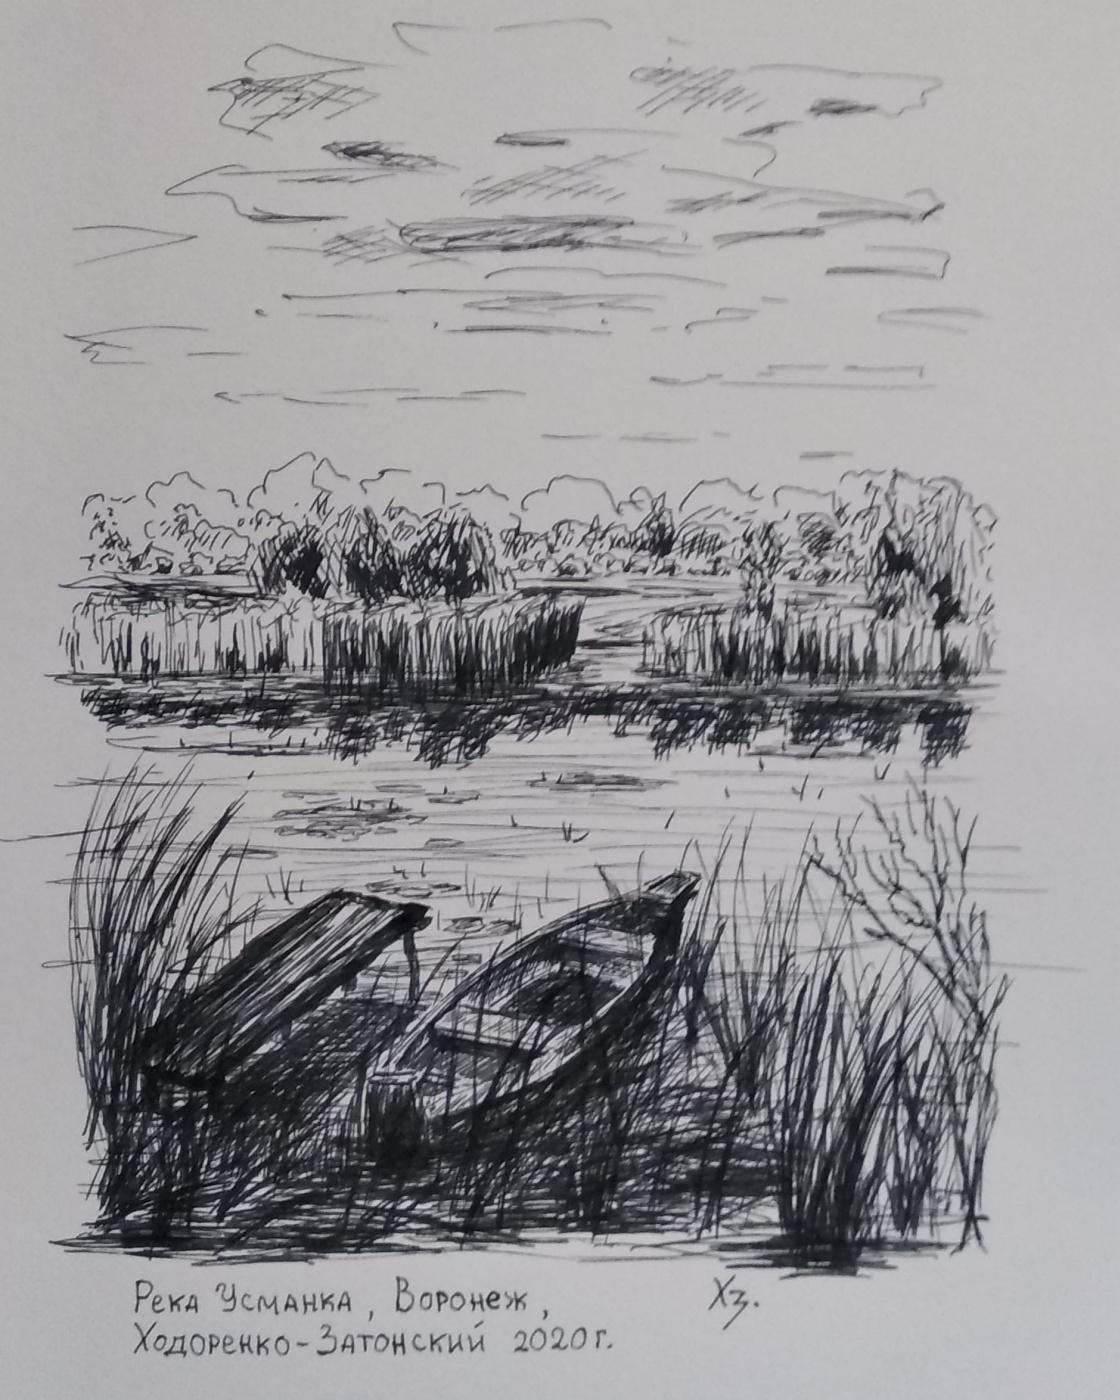 Sergei Nikolayevich Khodorenko-Zatonsky. Usmanka River